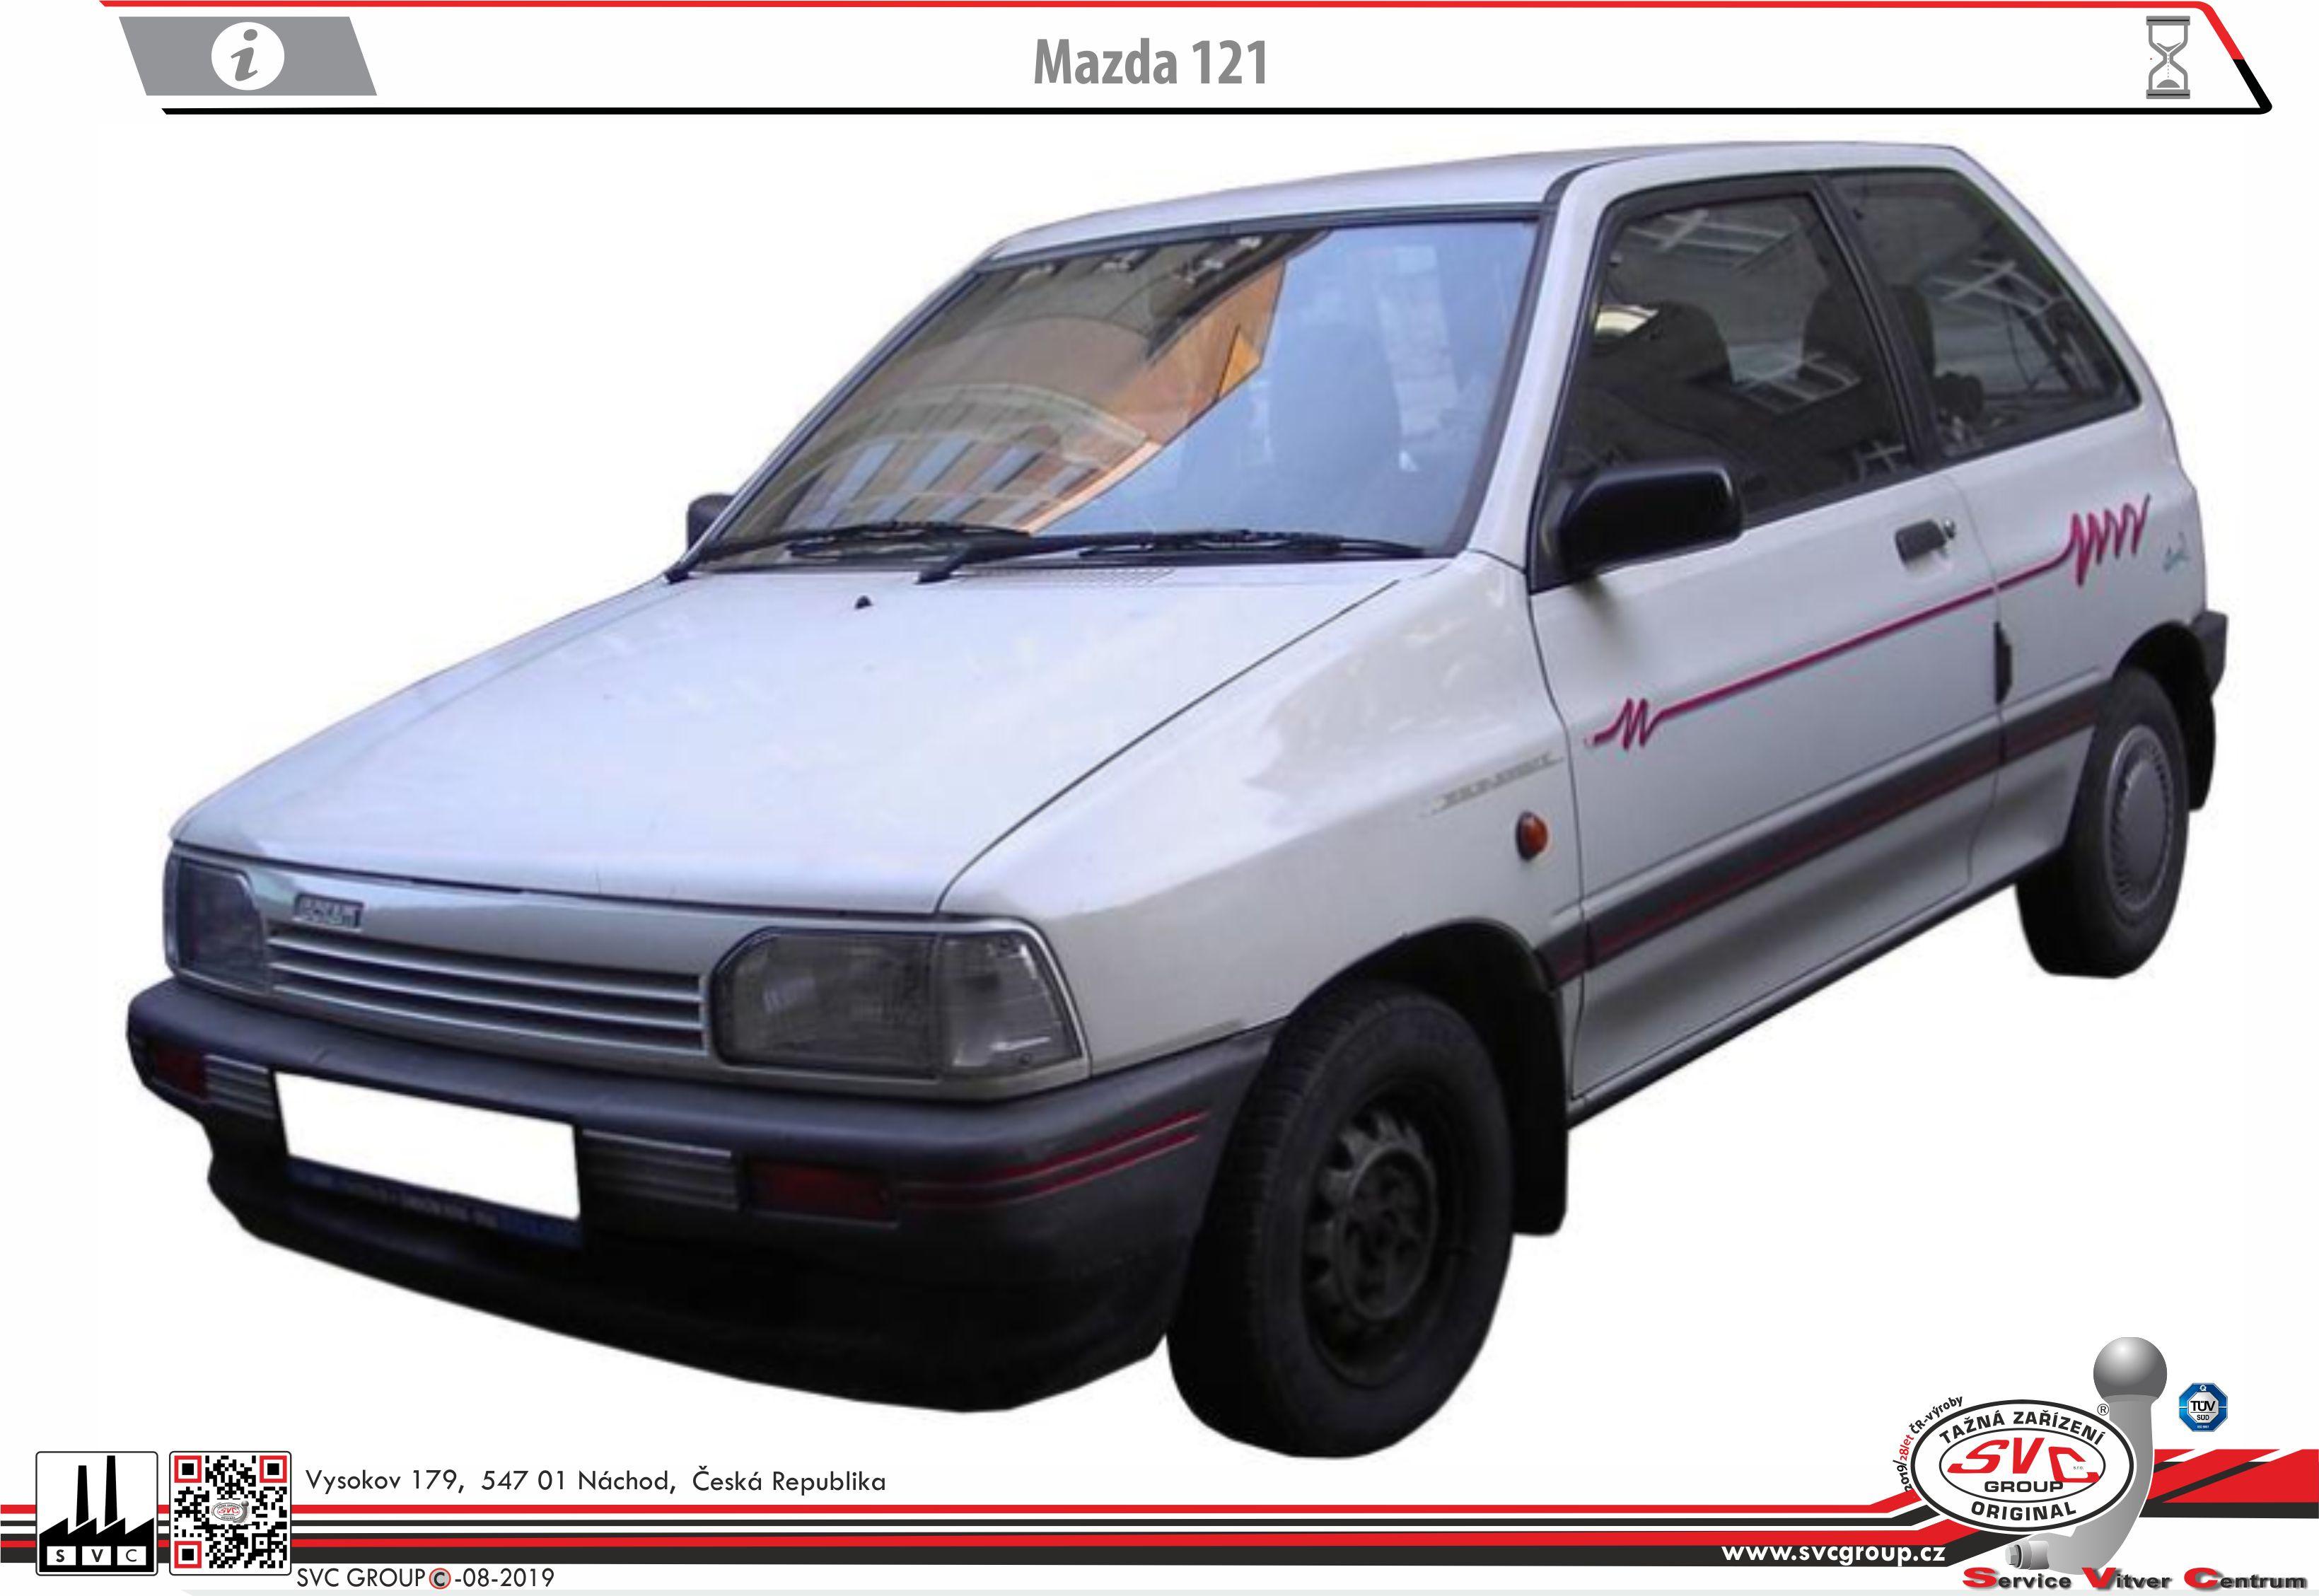 Mazda 121 Hatchback